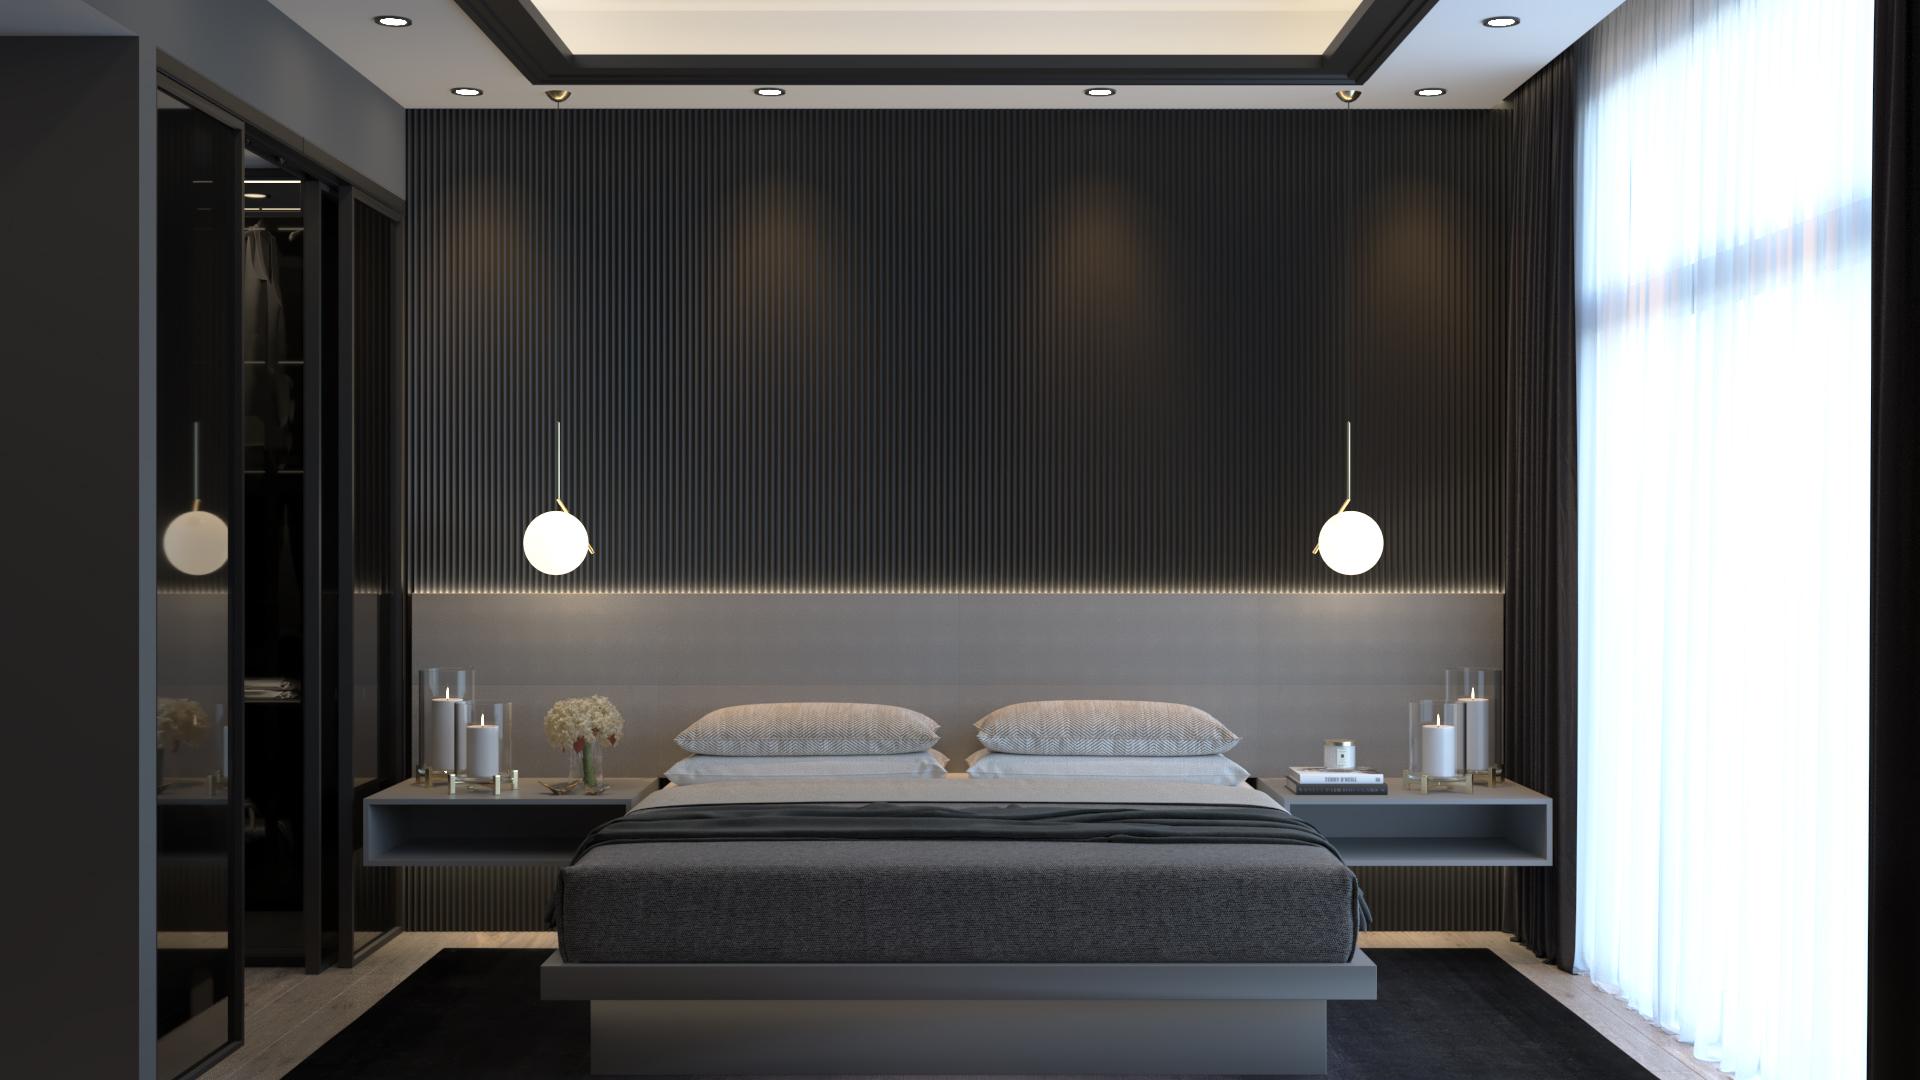 Luxury bedroom 01 total